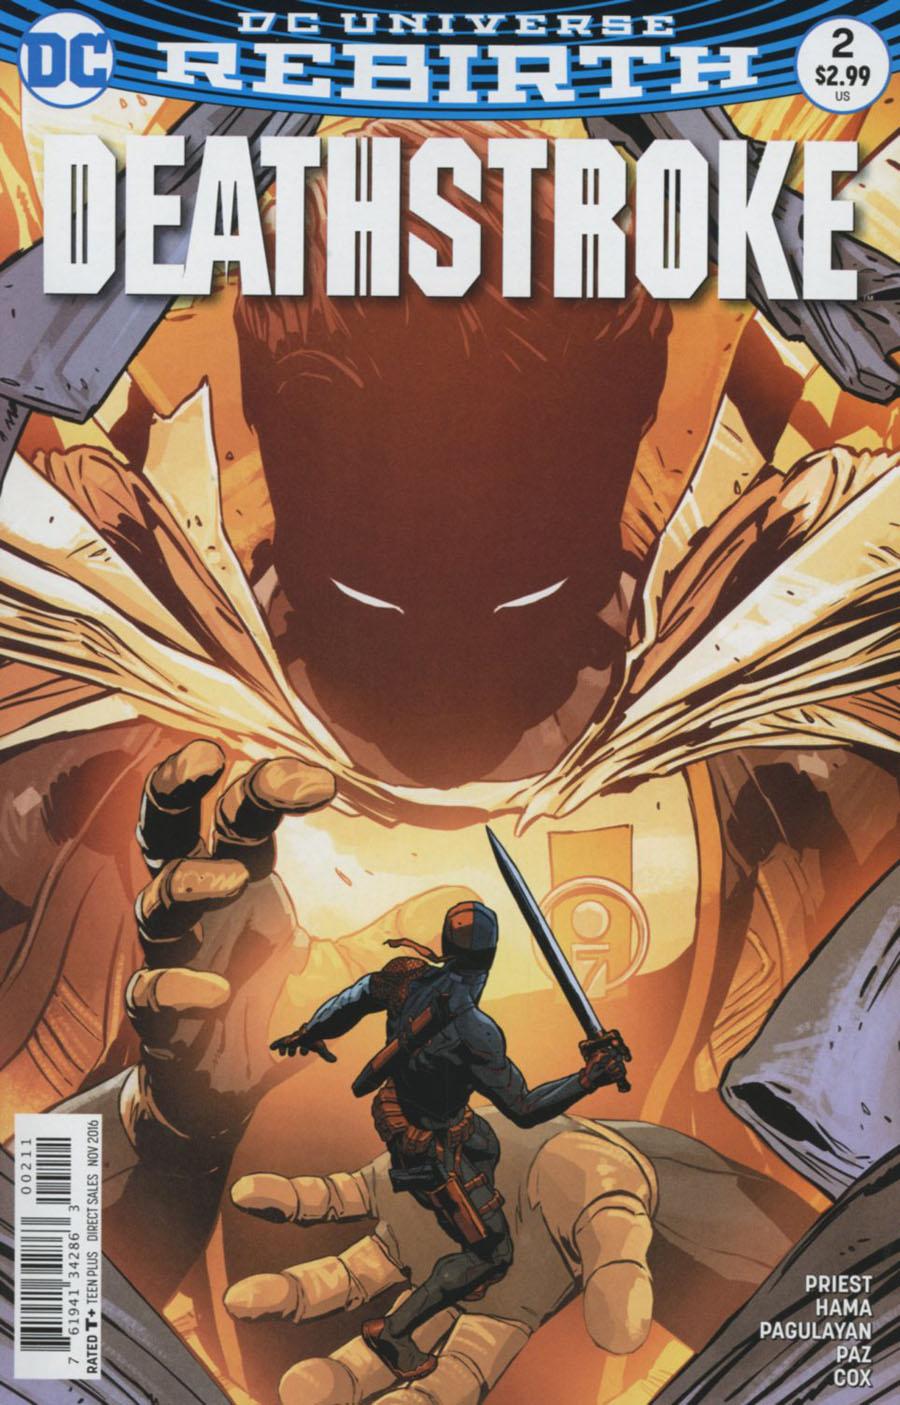 Deathstroke Vol 4 #2 Cover A Regular Aco Cover